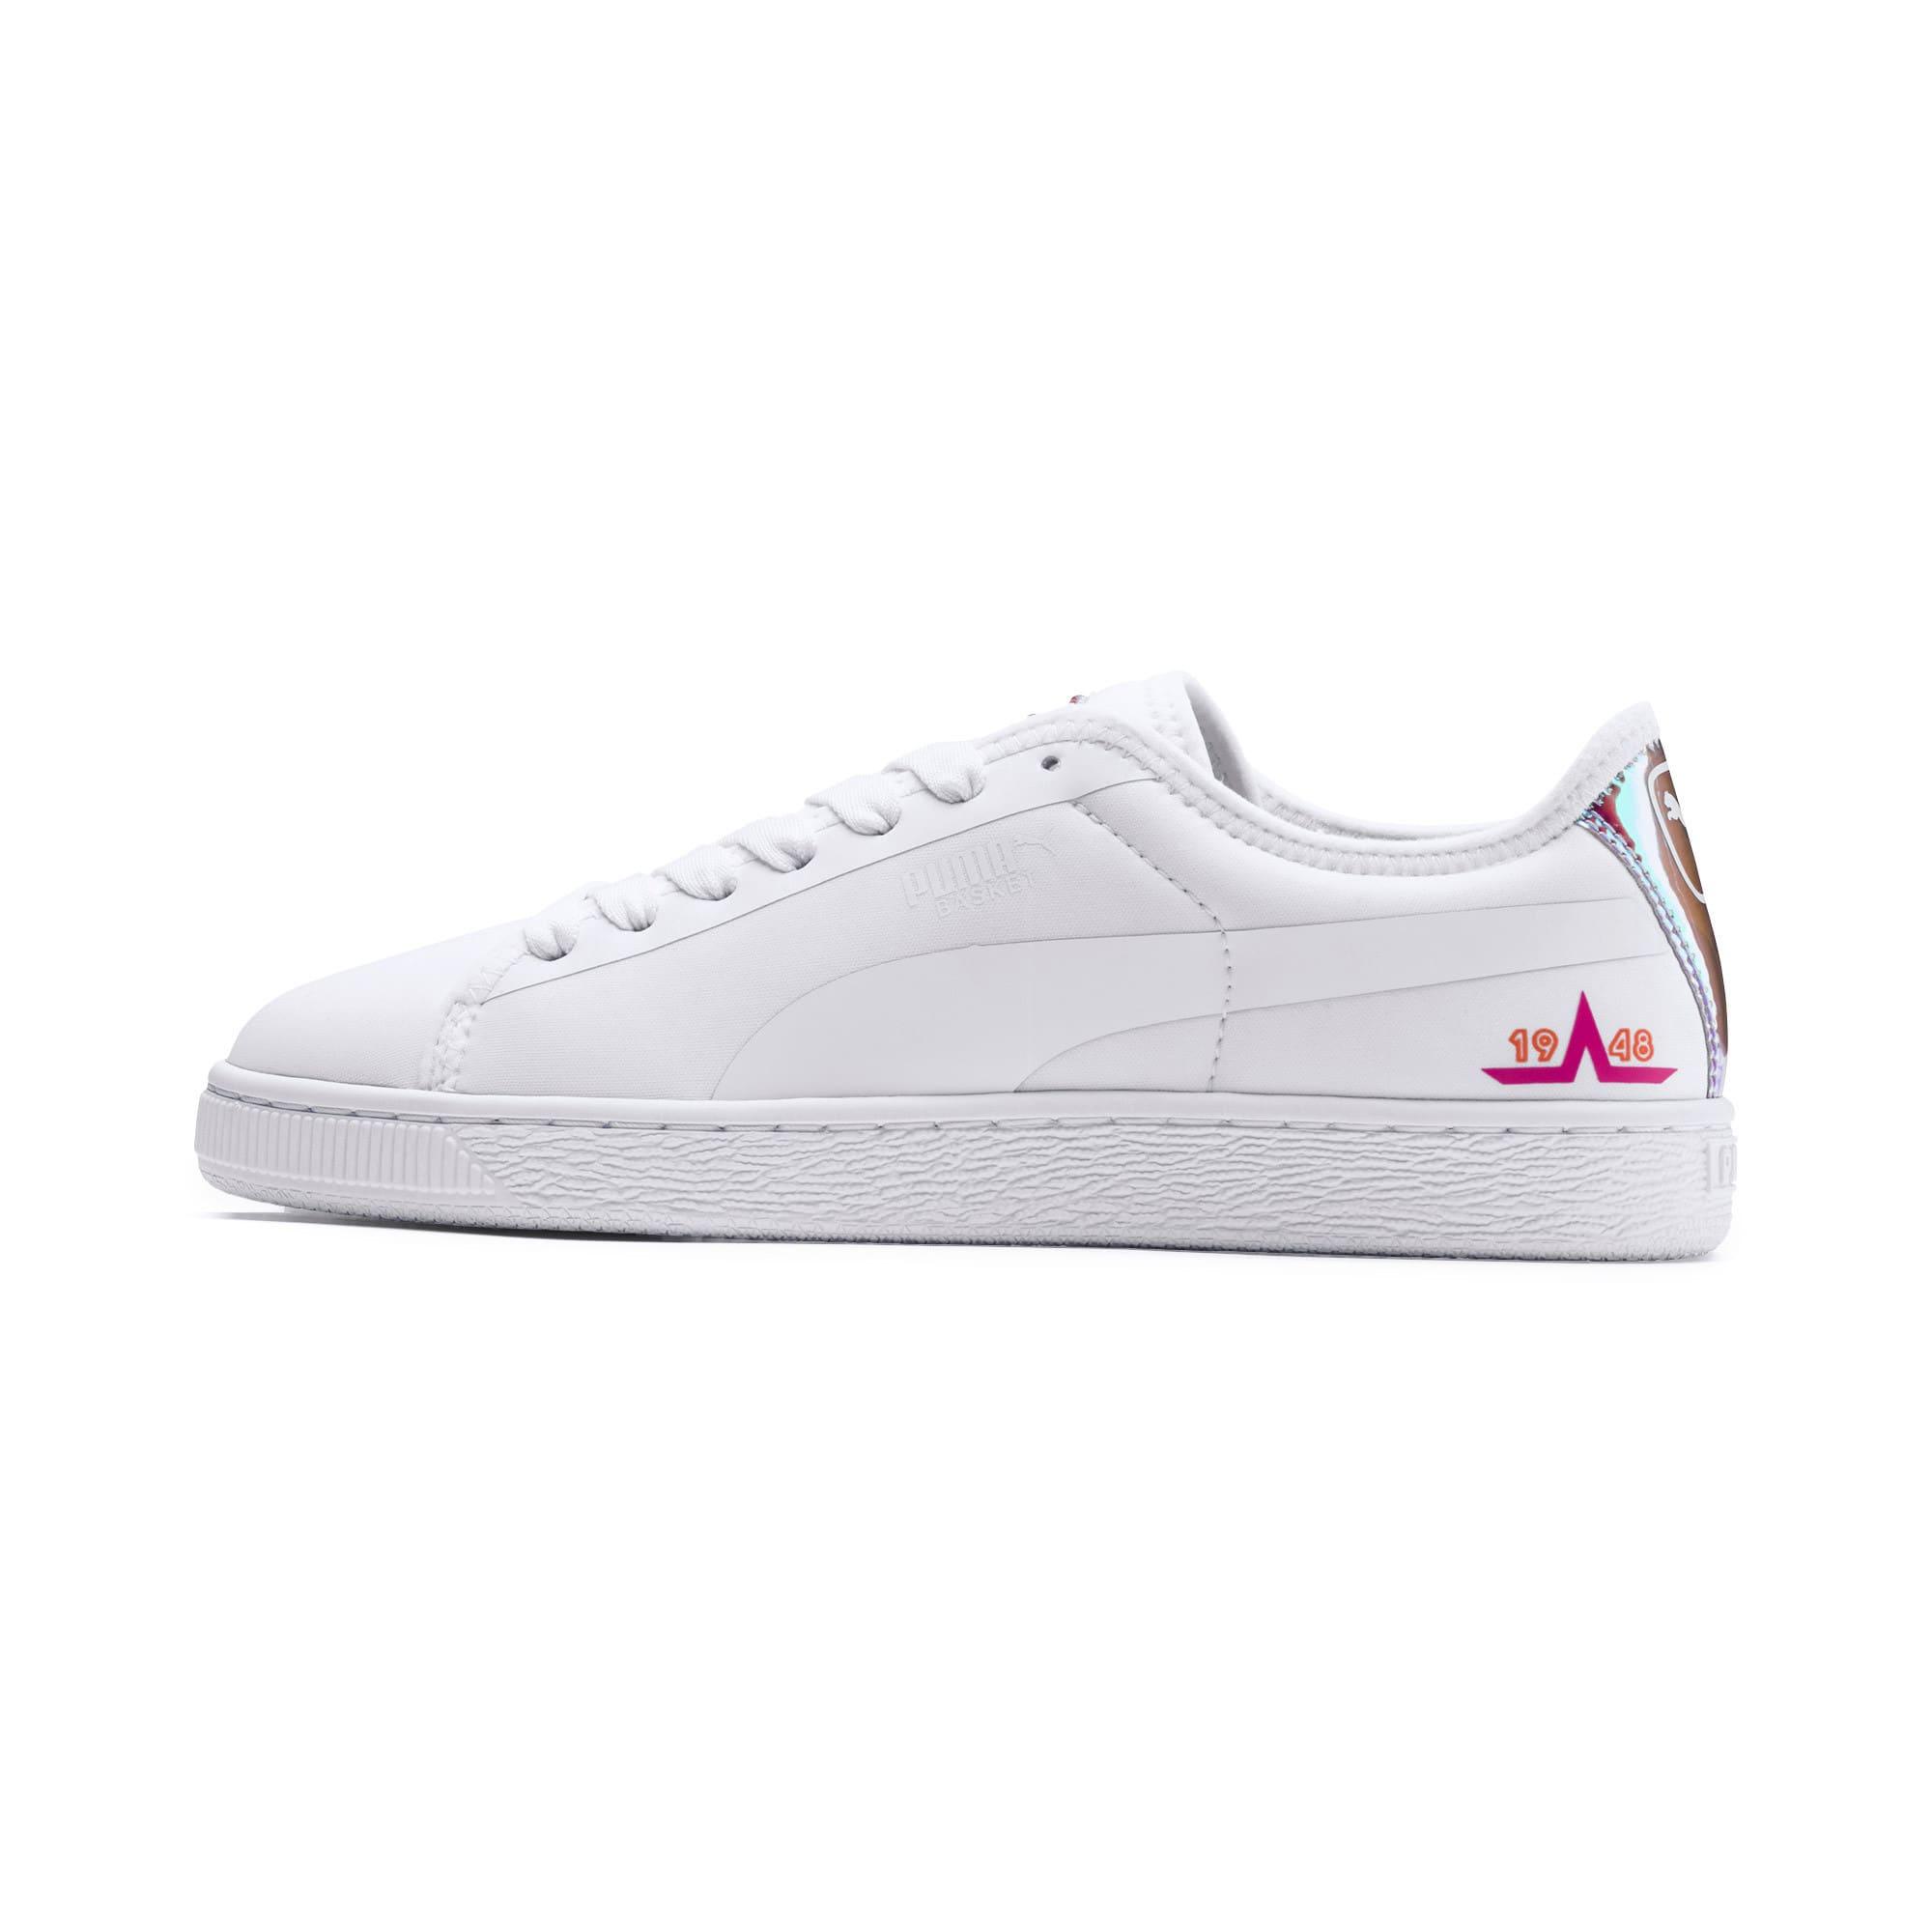 Miniatura 1 de Zapatos deportivos  Basket Trailblazerpara mujer, Puma White-Fuchsia Purple, mediano